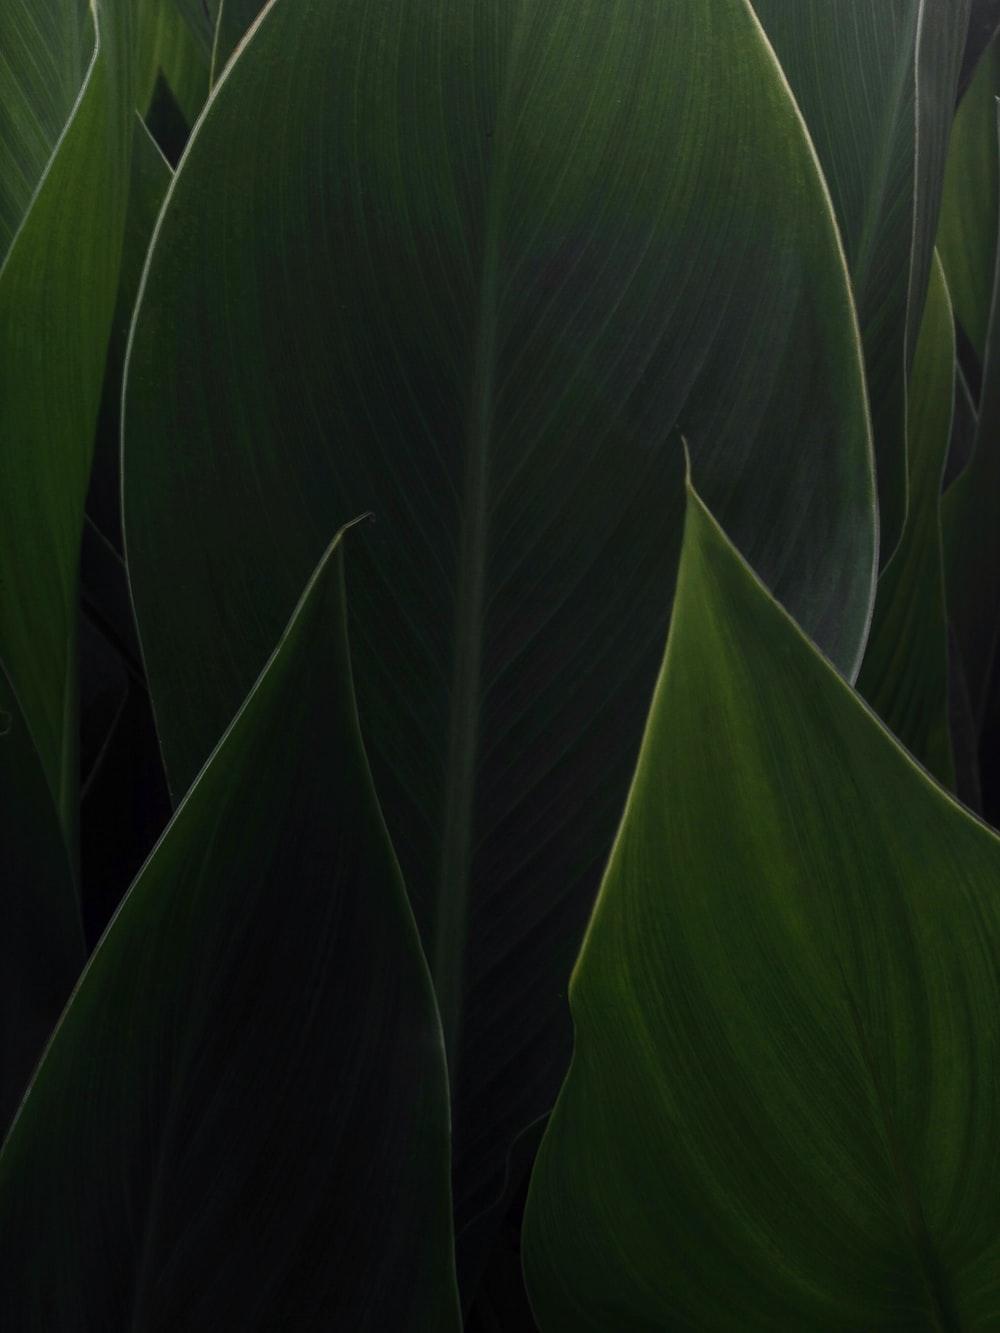 shallow focus photo ofgreen leaf